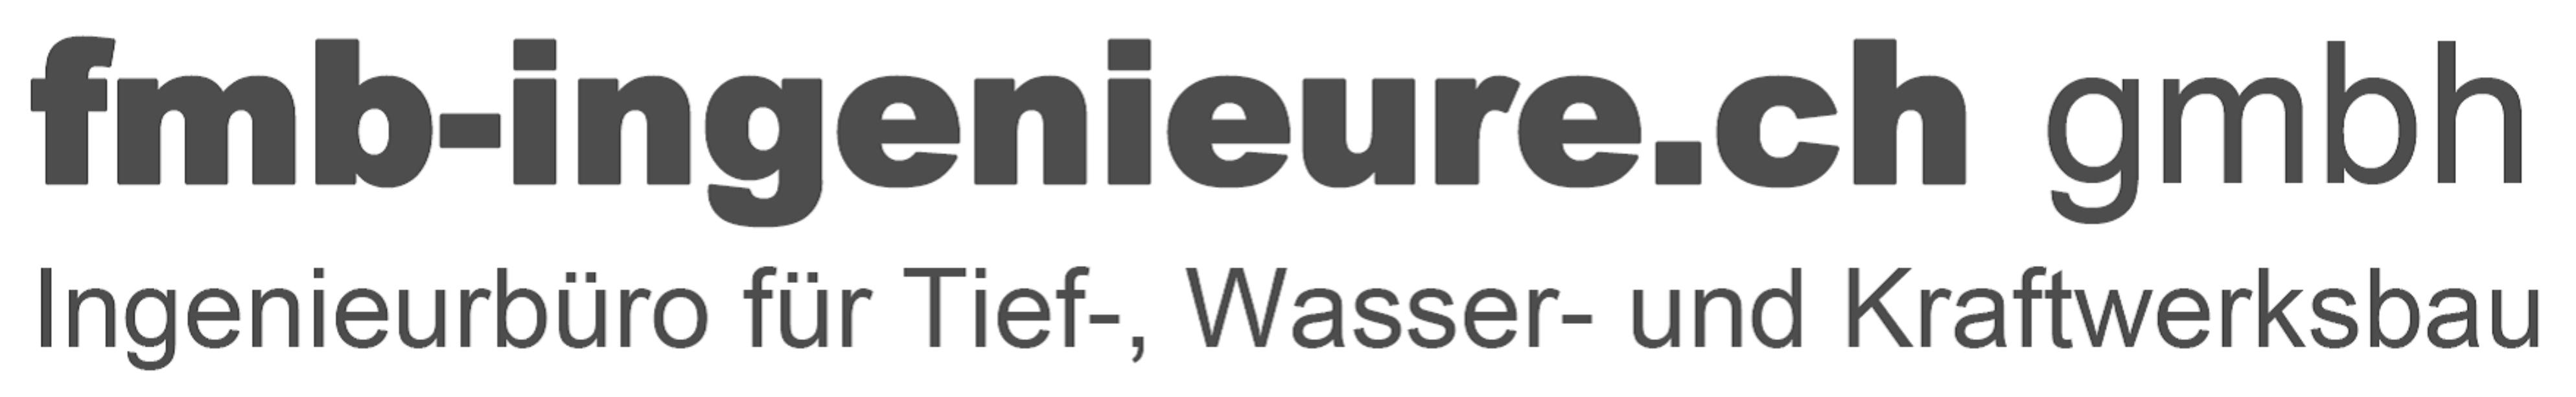 fmb-ingenieure.ch